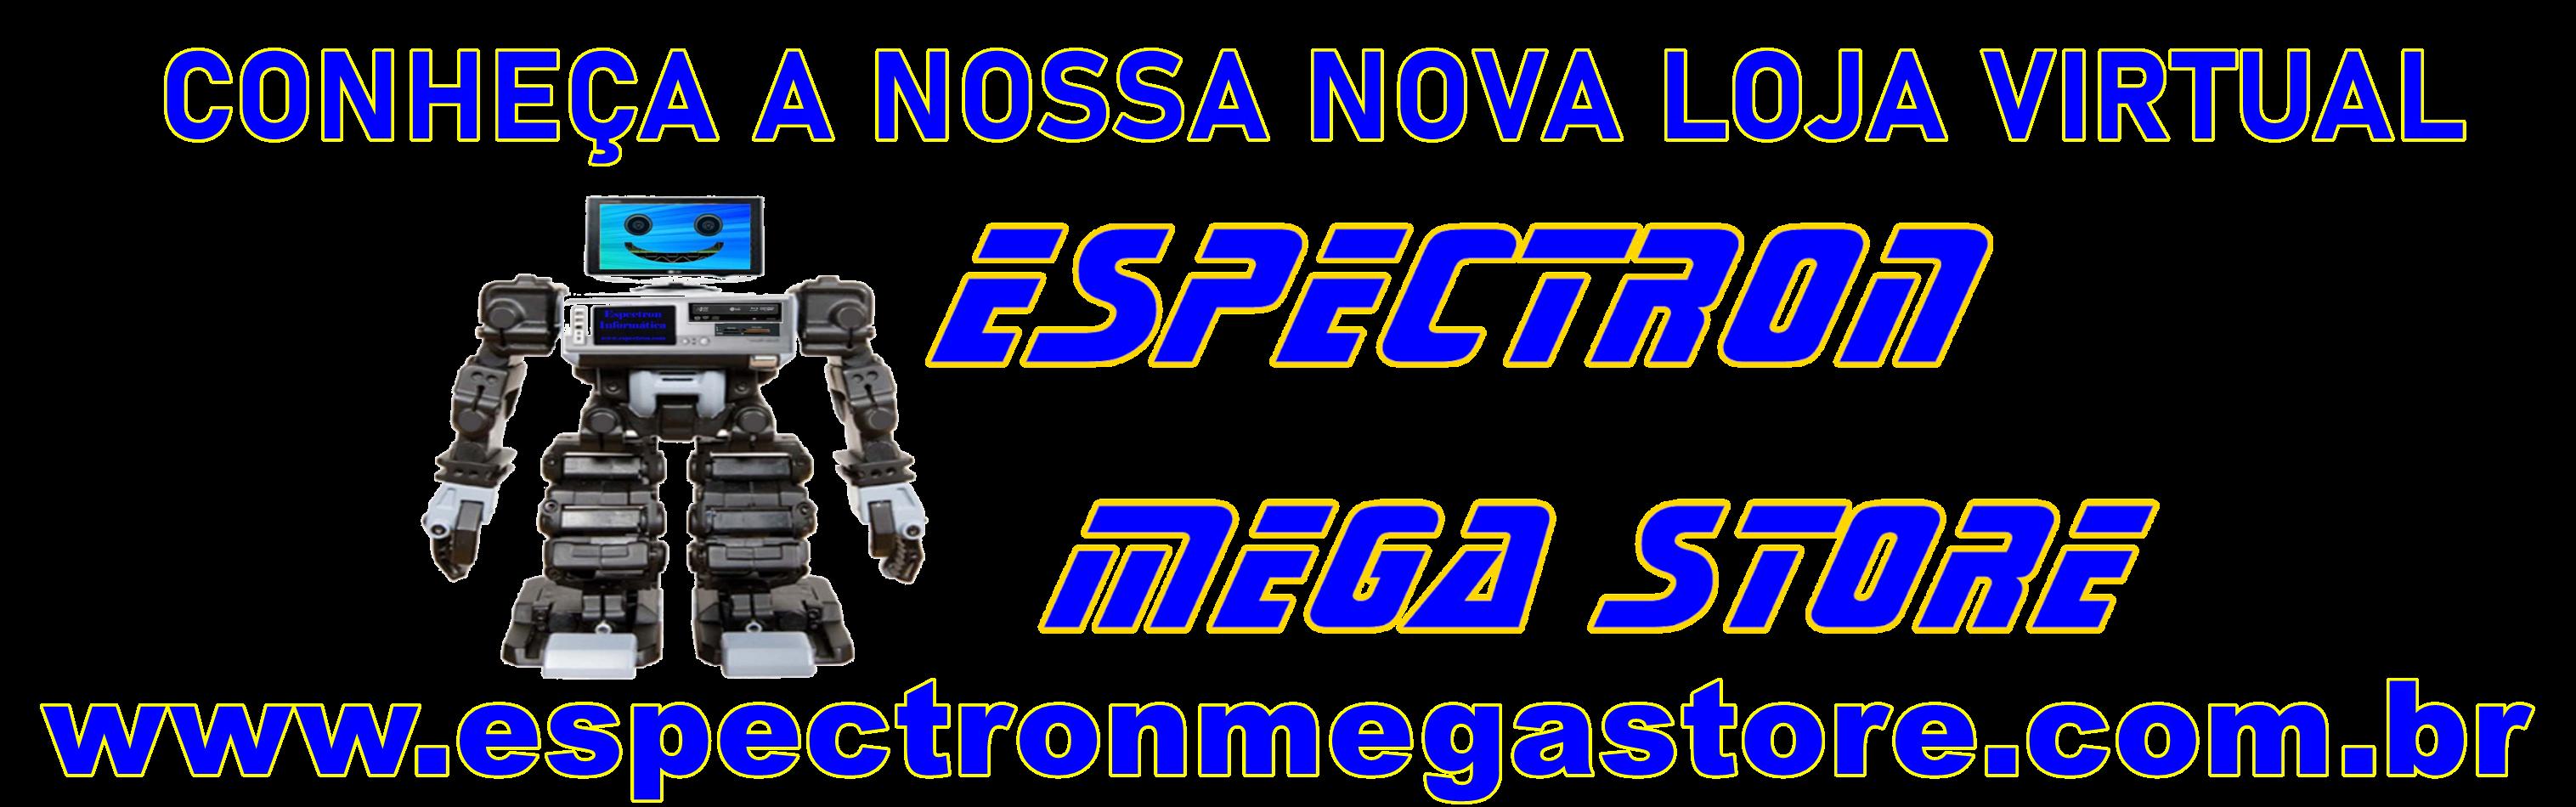 Conheça nossa nova Loja Espectron Mega Store https:www.espectronmegastore.com.br